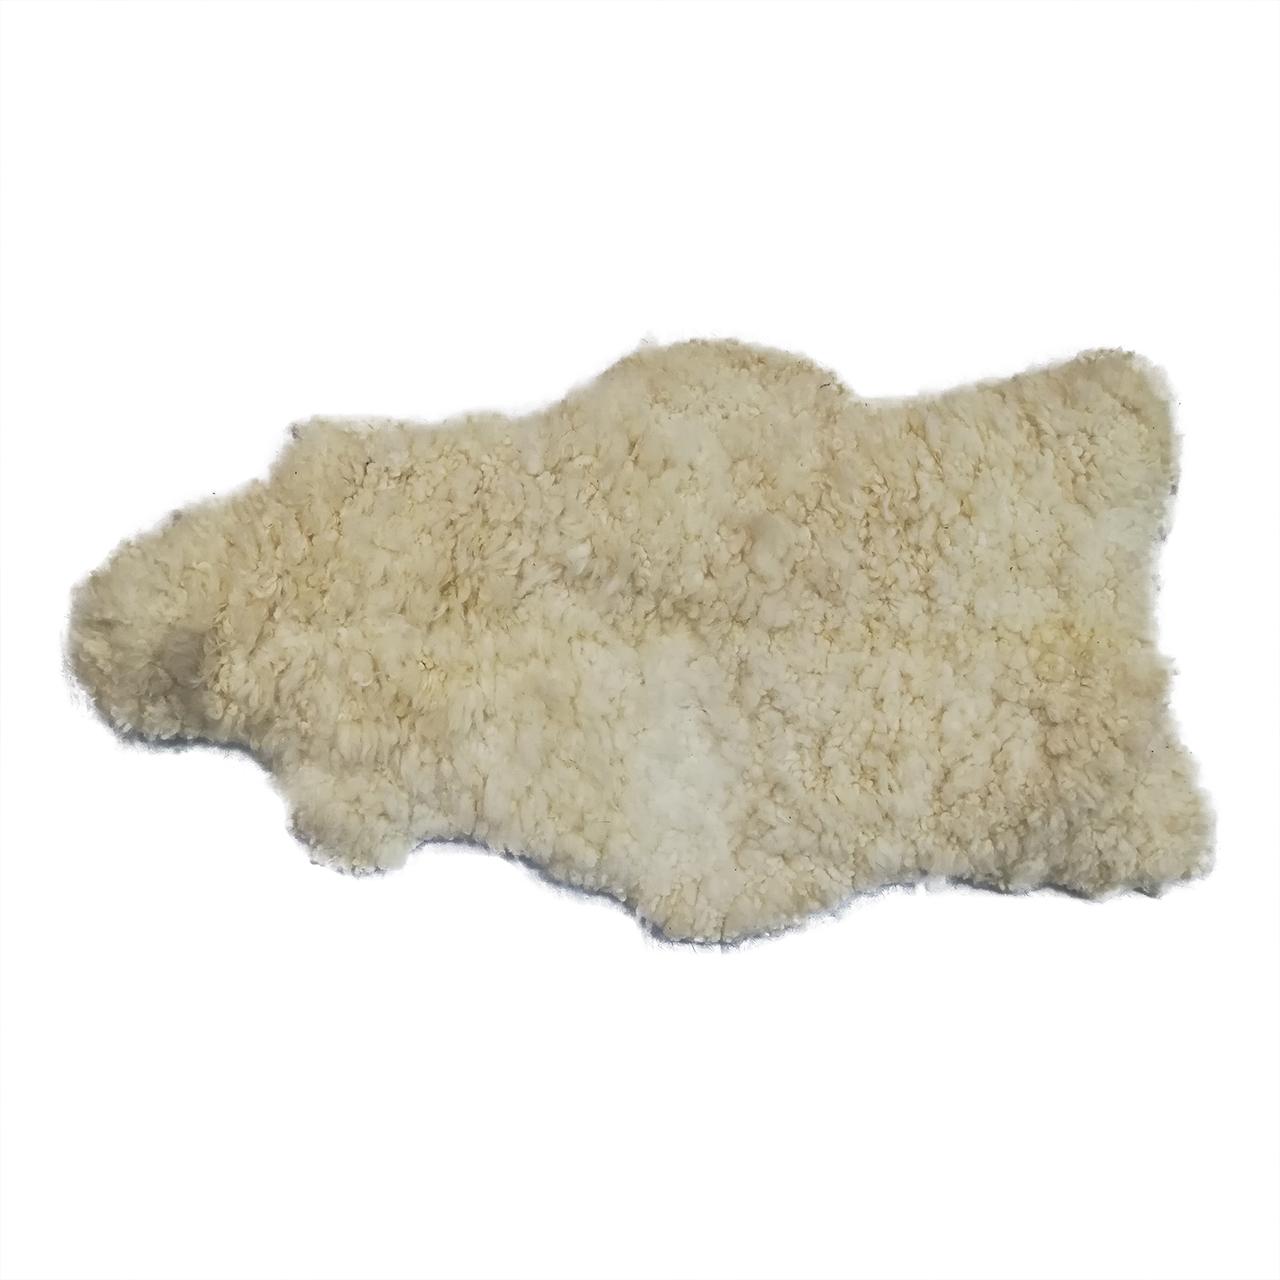 فرش پوست و چرم کمالی مدل AB-00237